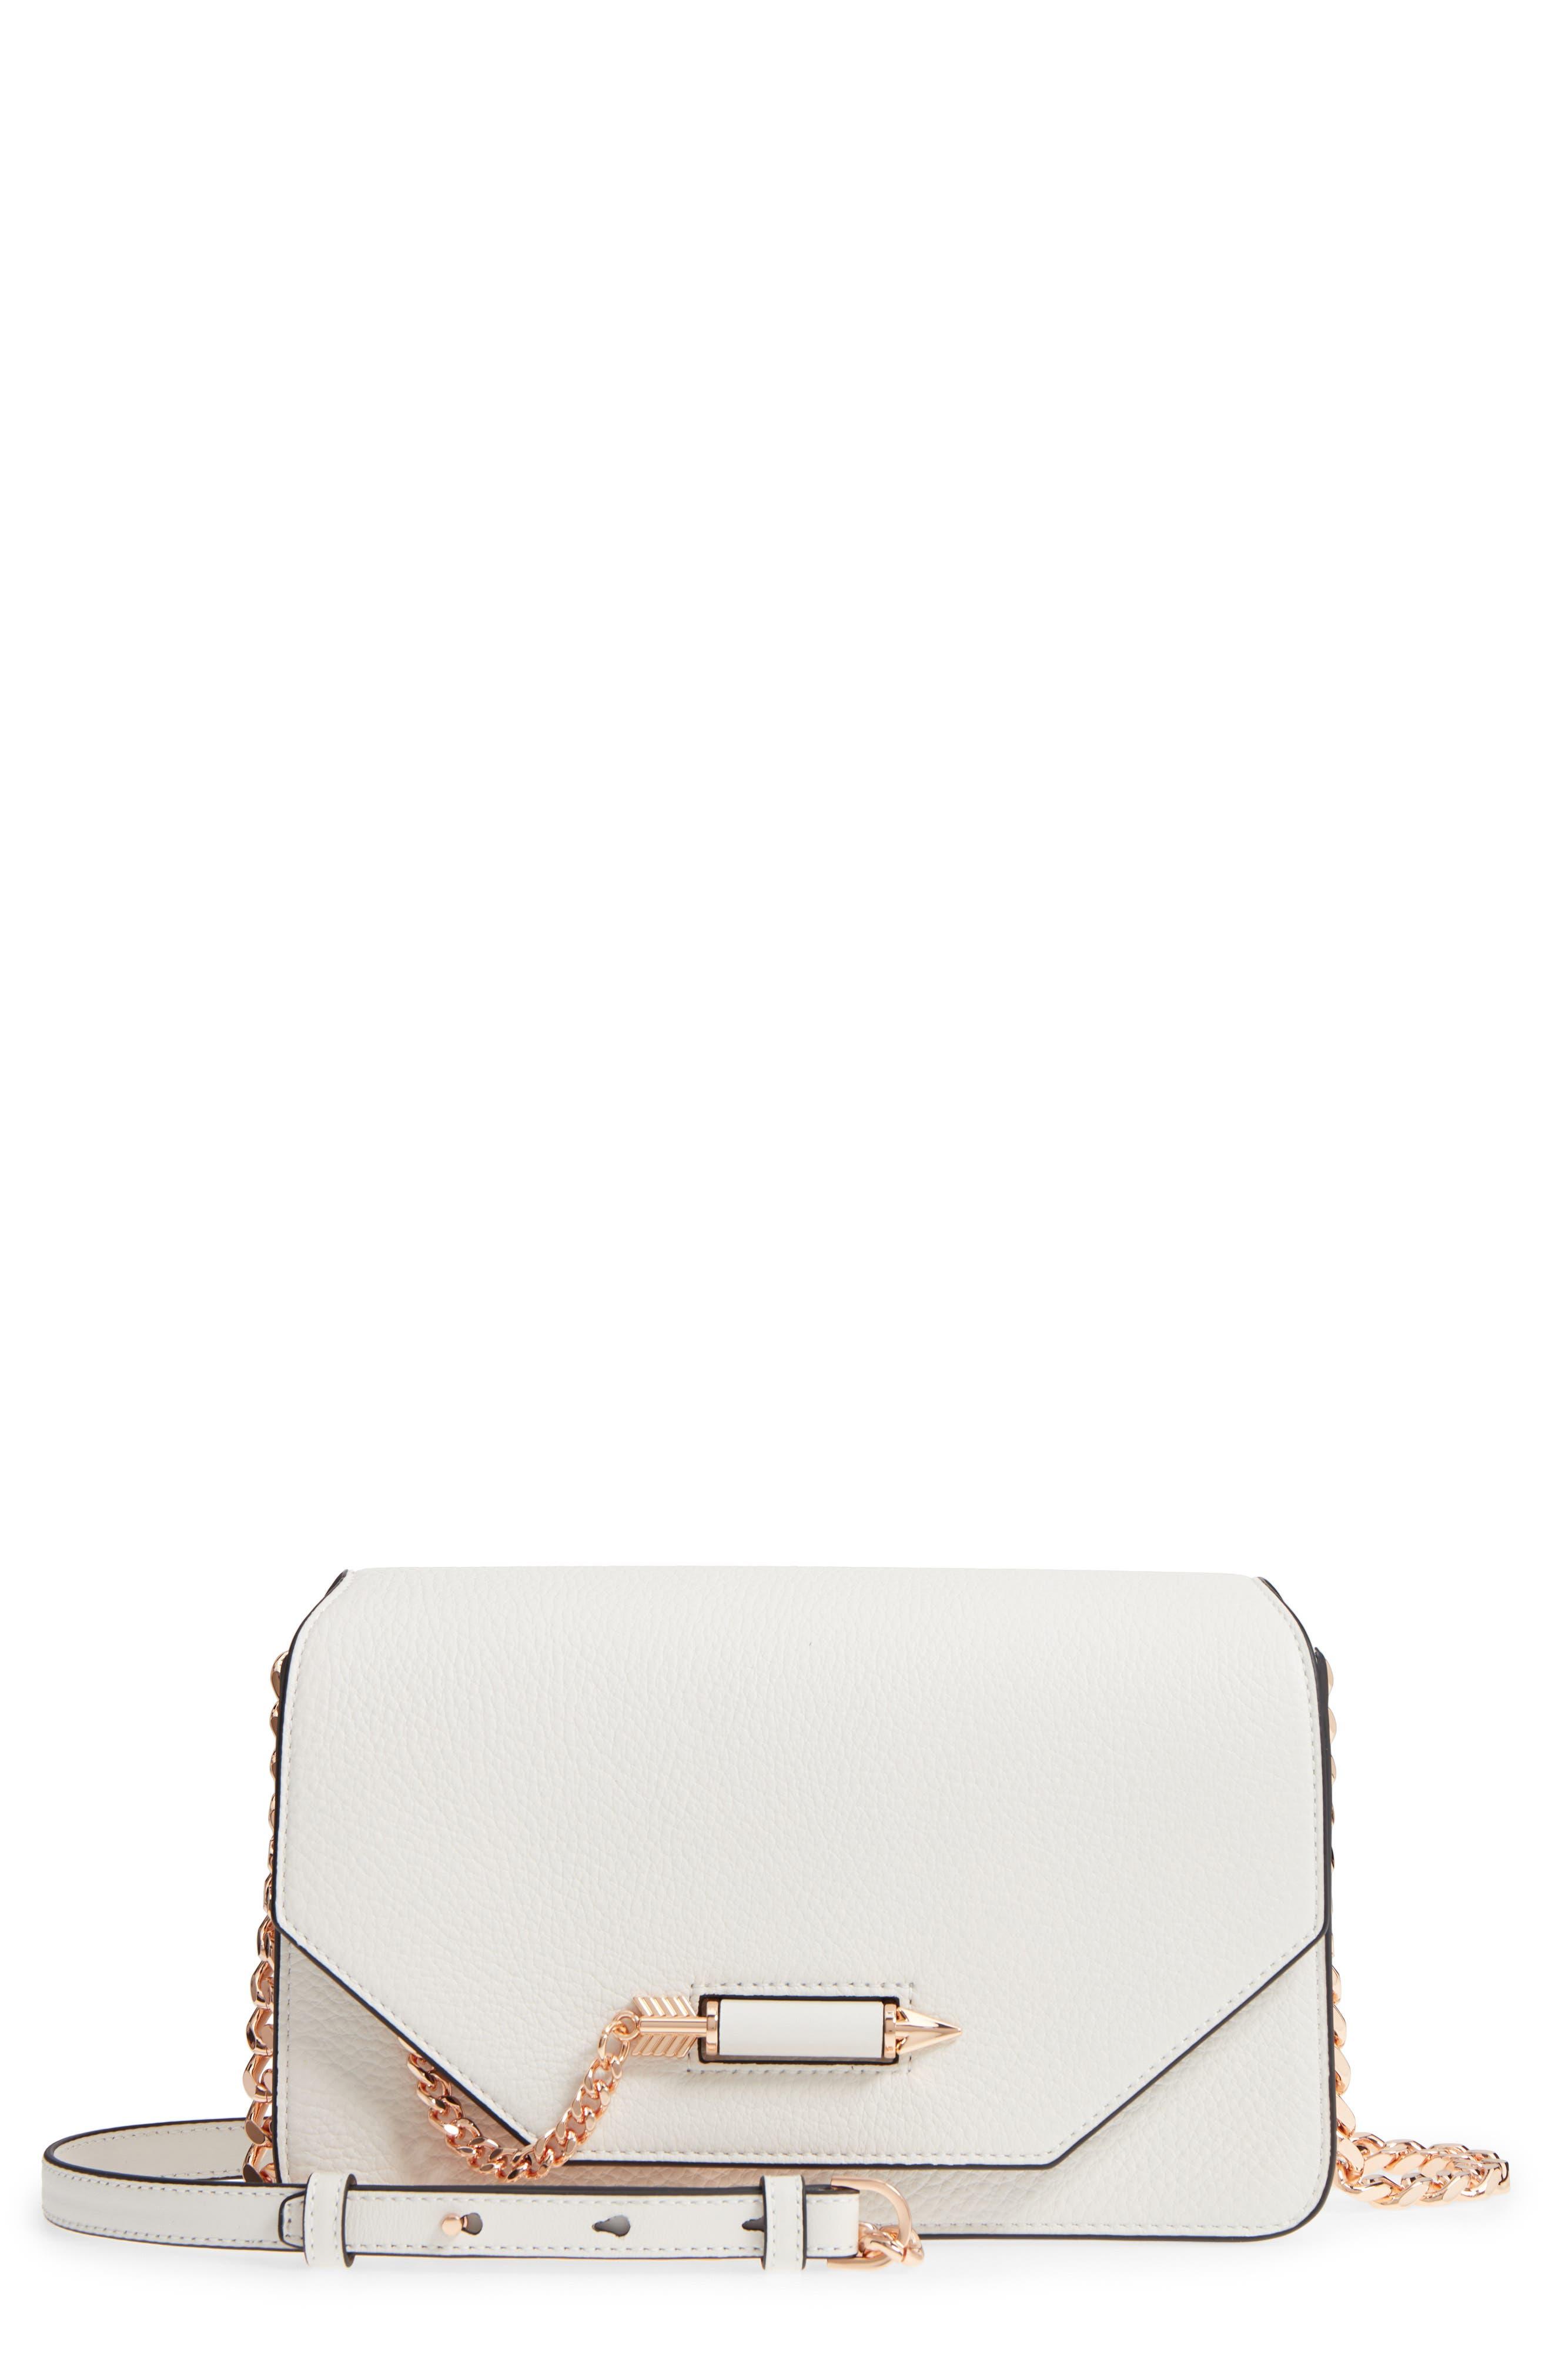 Cortney Nappa Leather Shoulder/Crossbody Bag,                             Main thumbnail 1, color,                             White/ Rose Gold